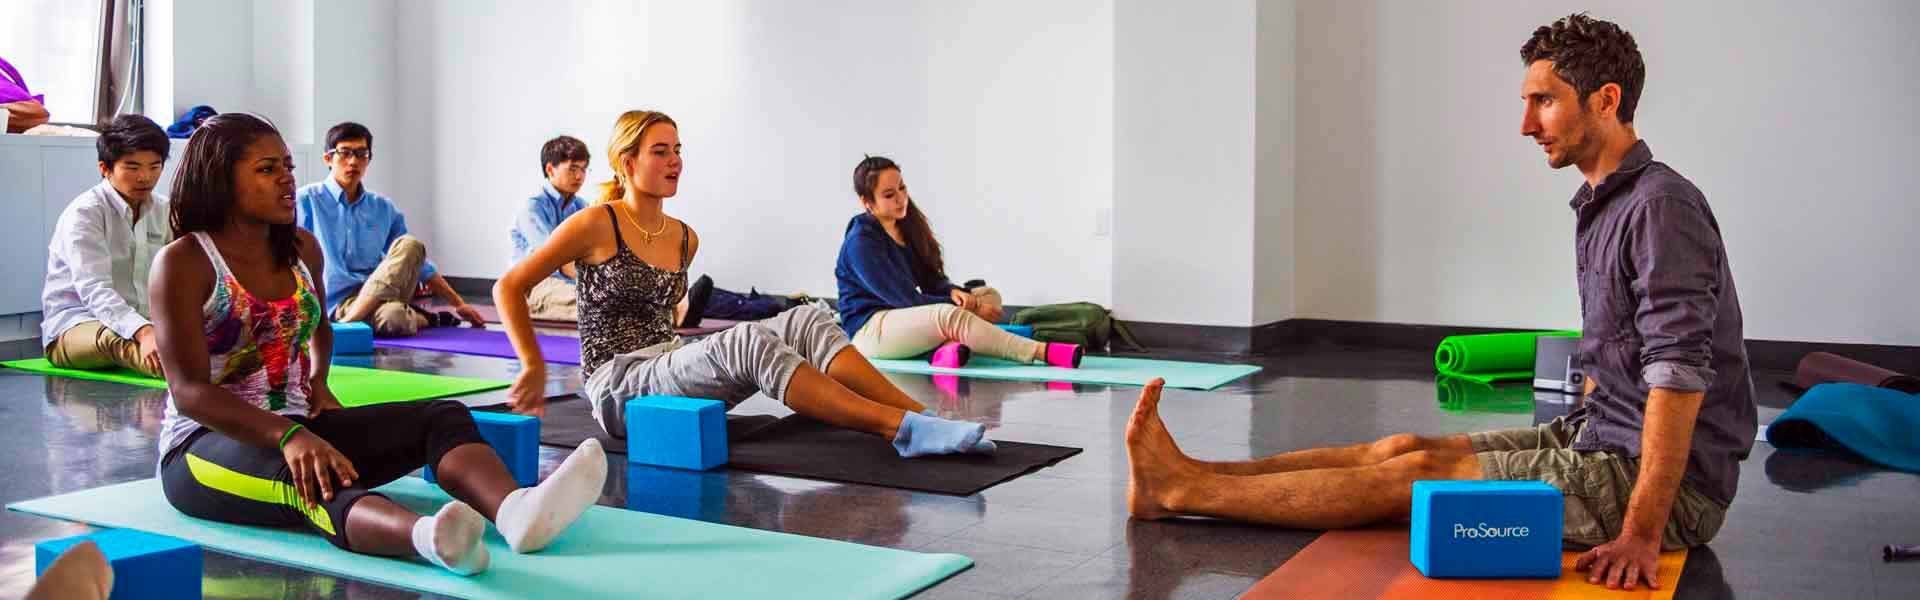 LemanManhattan-highchool-NY-Yoga-MAin-BAnner